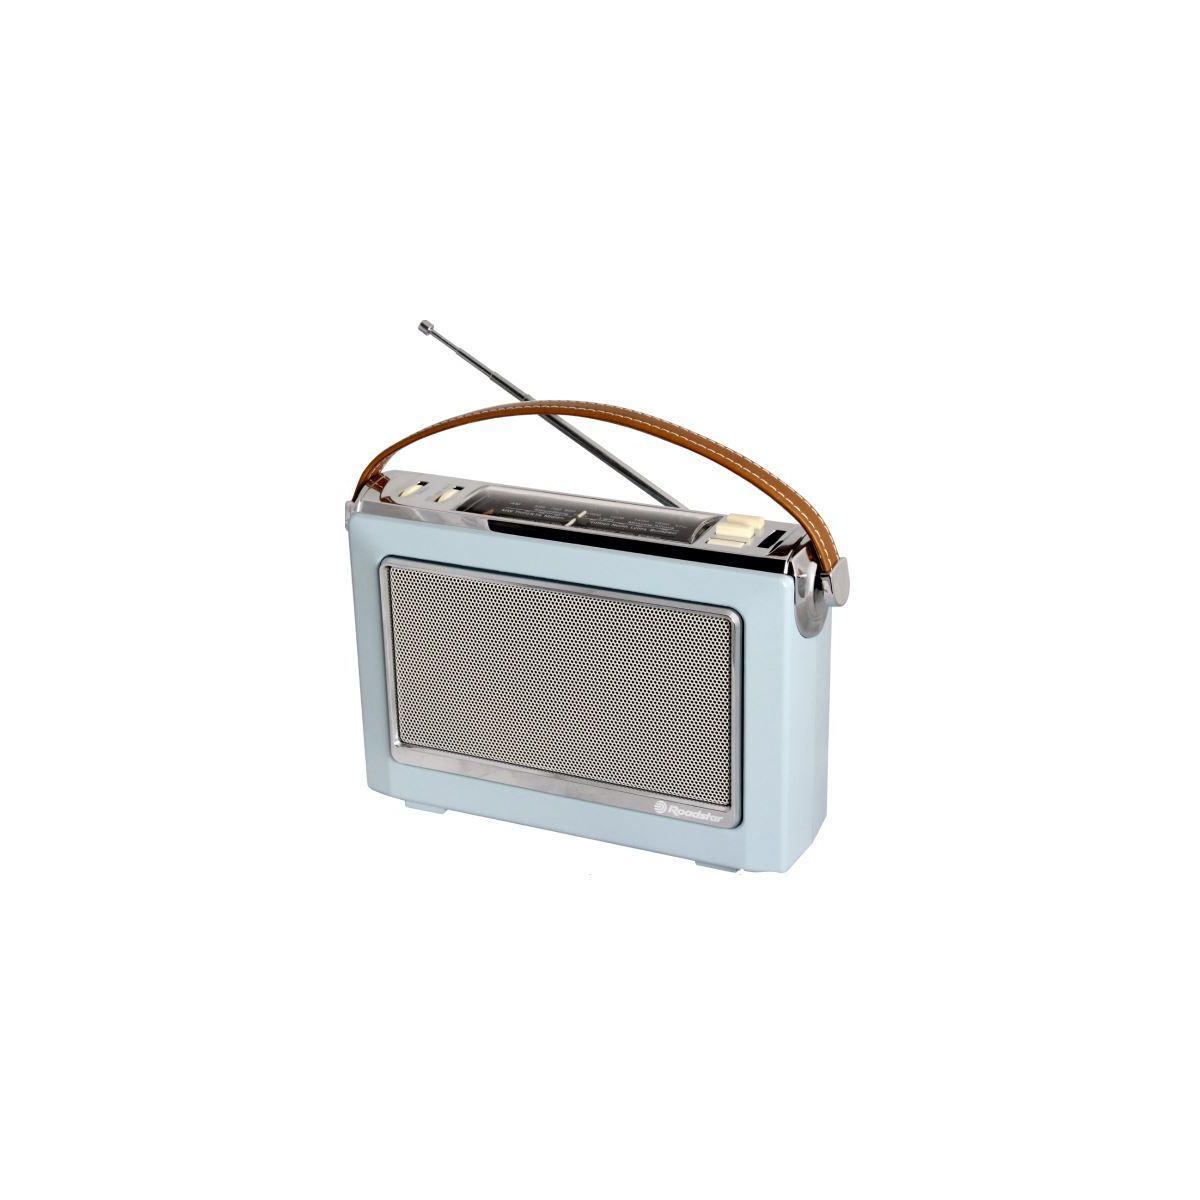 Radio analogique roadstar tra-1966/lb - 5% de remise imm?diate...